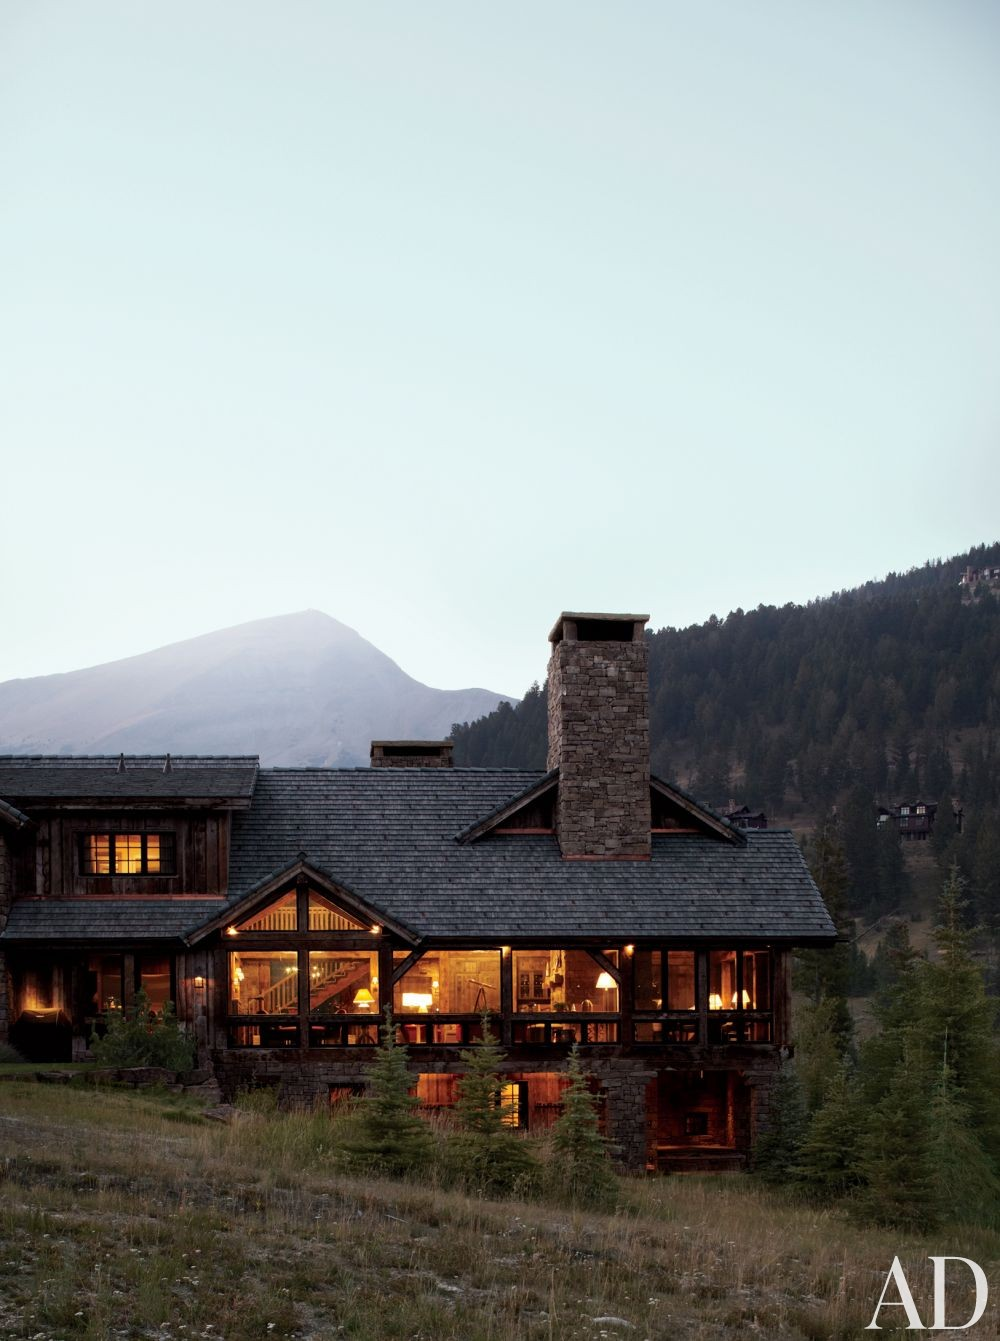 Rustic Exterior by Markham Roberts Inc. and JLF & Associates Inc. in Big Sky, Montana